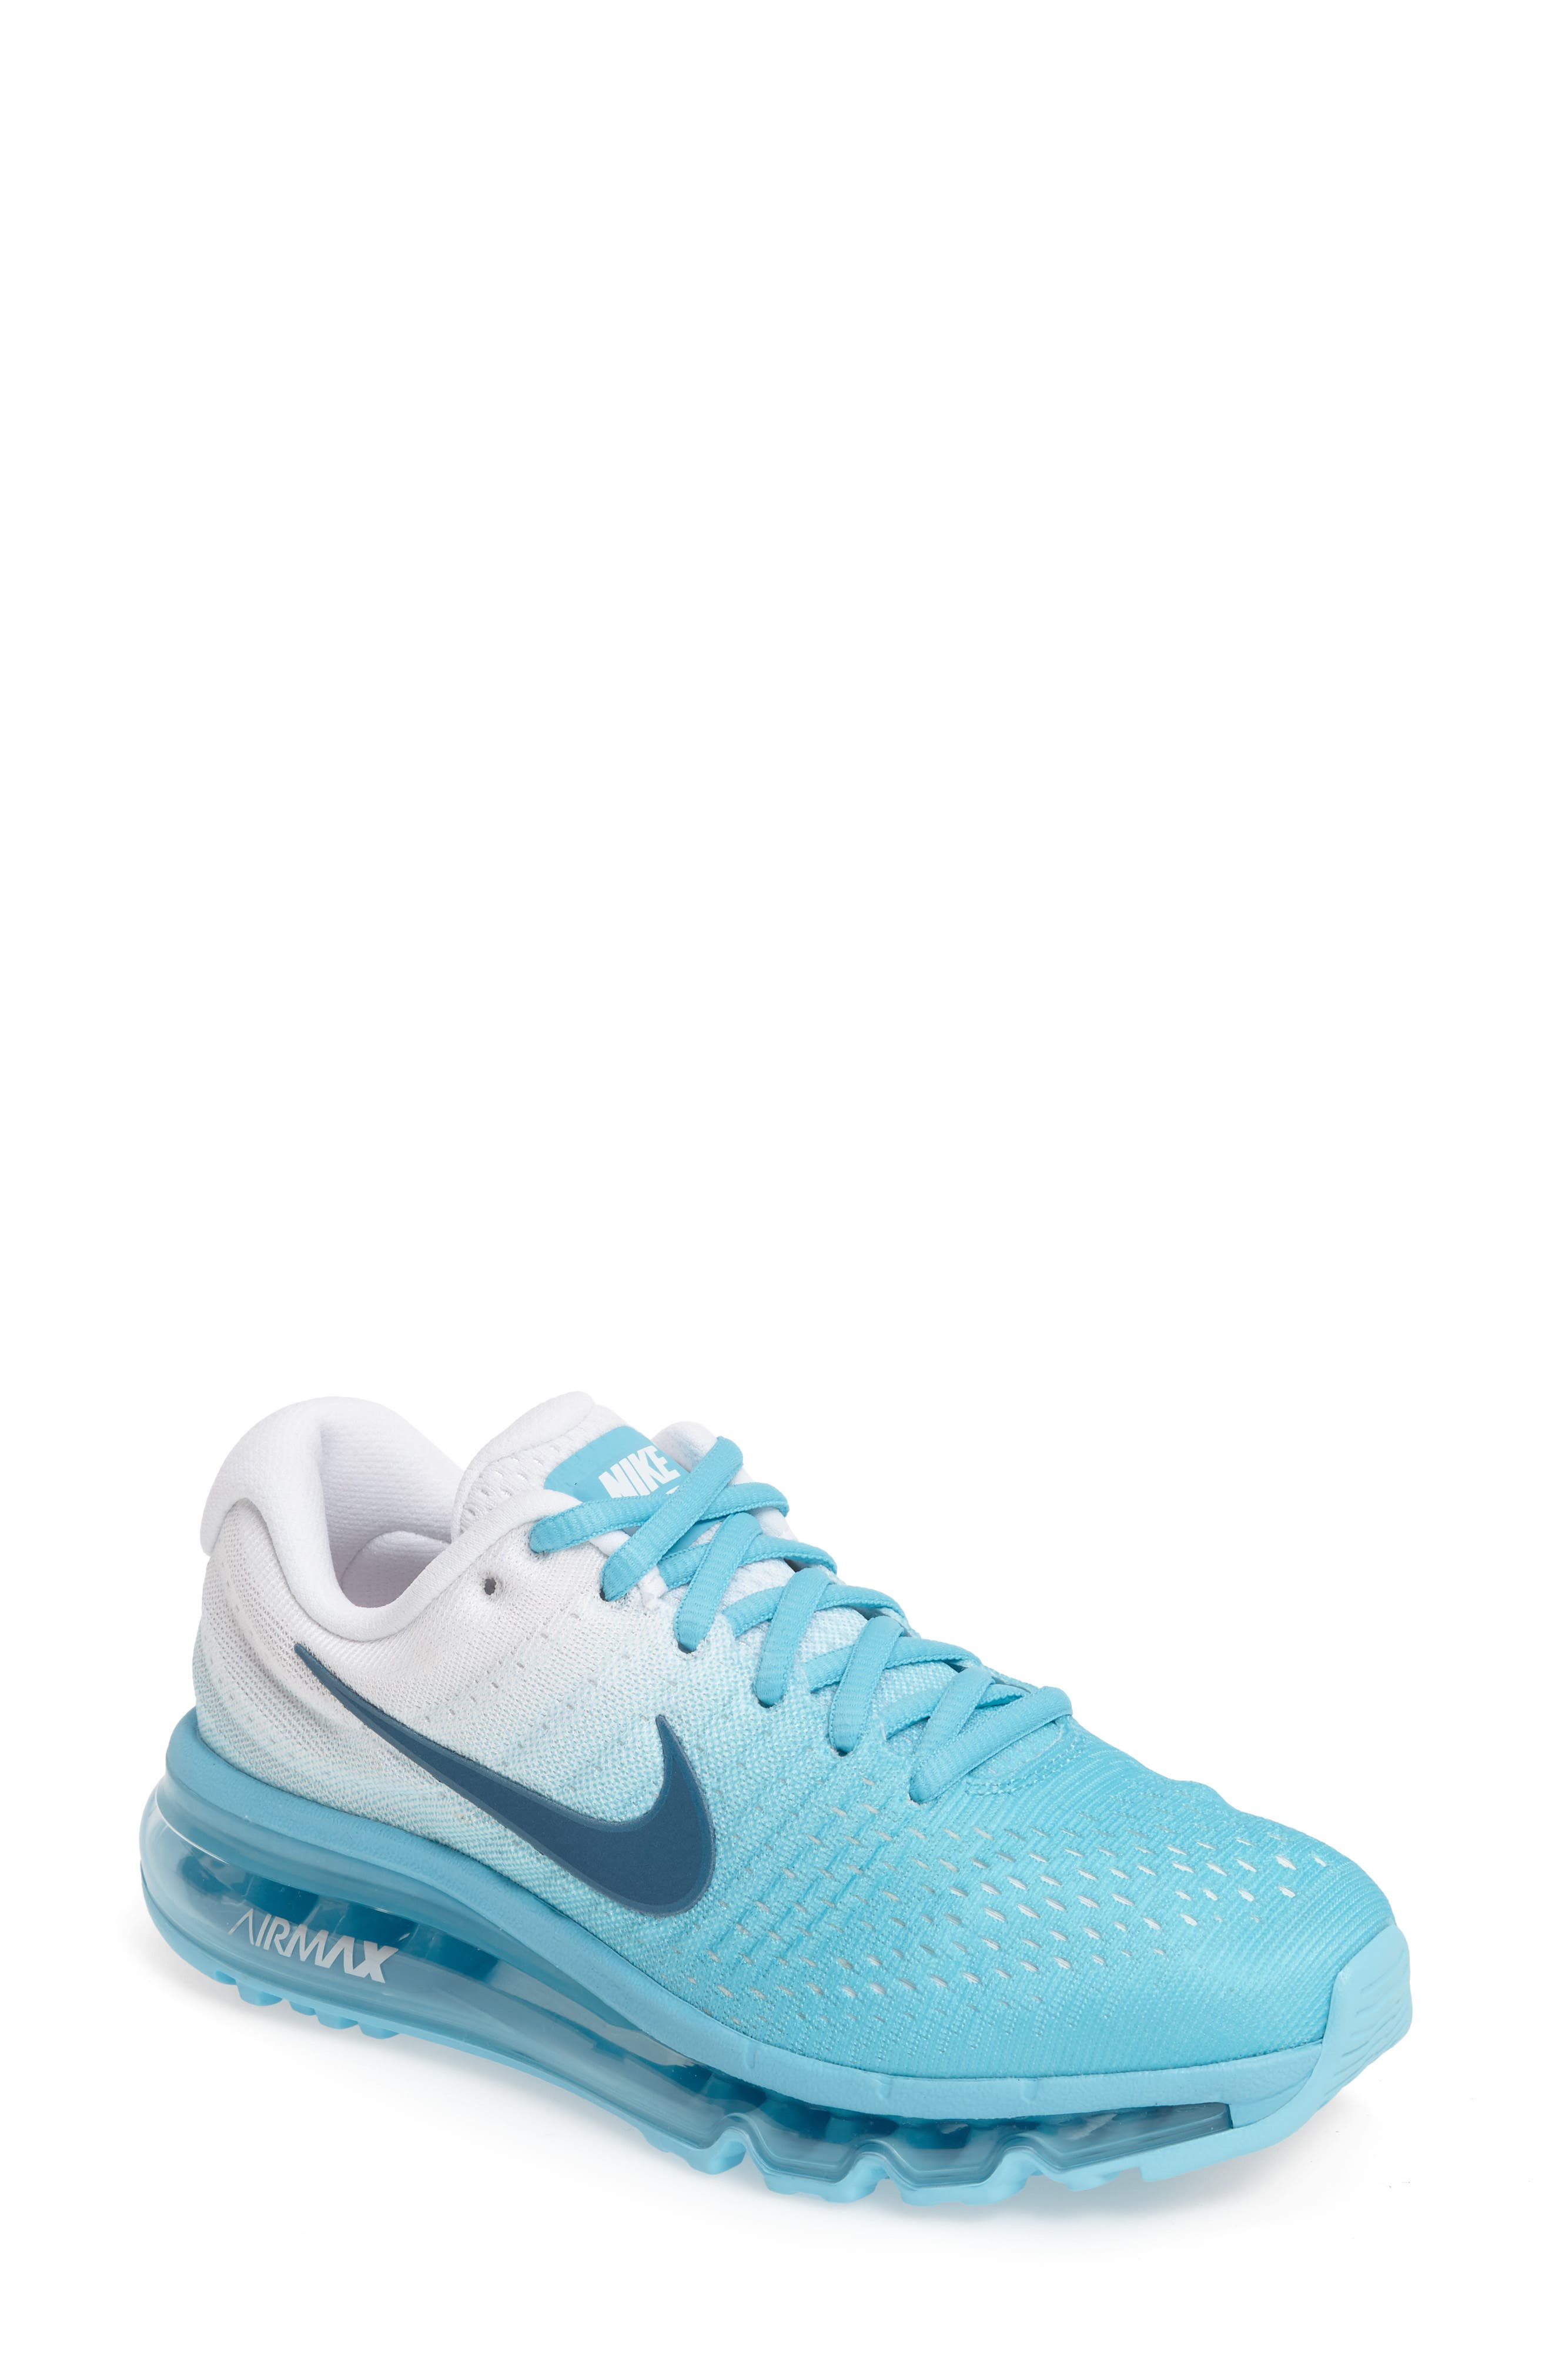 Main Image - Nike Air Max 2017 Running Shoe (Women)